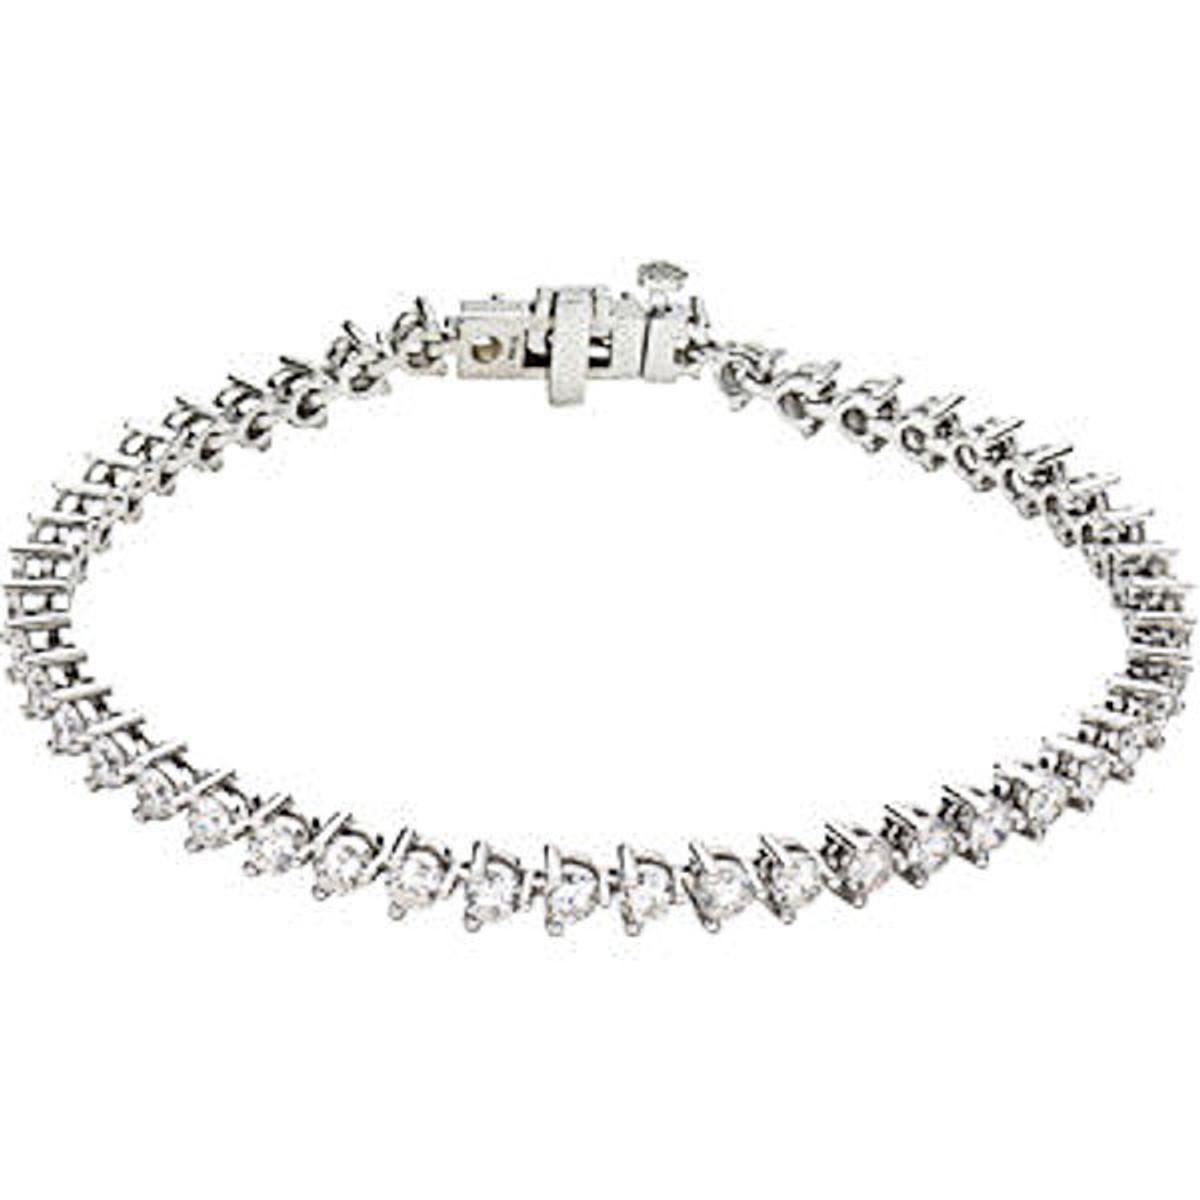 14Kt White Gold 4.8 ct tw Diamond Tennis Bracelet